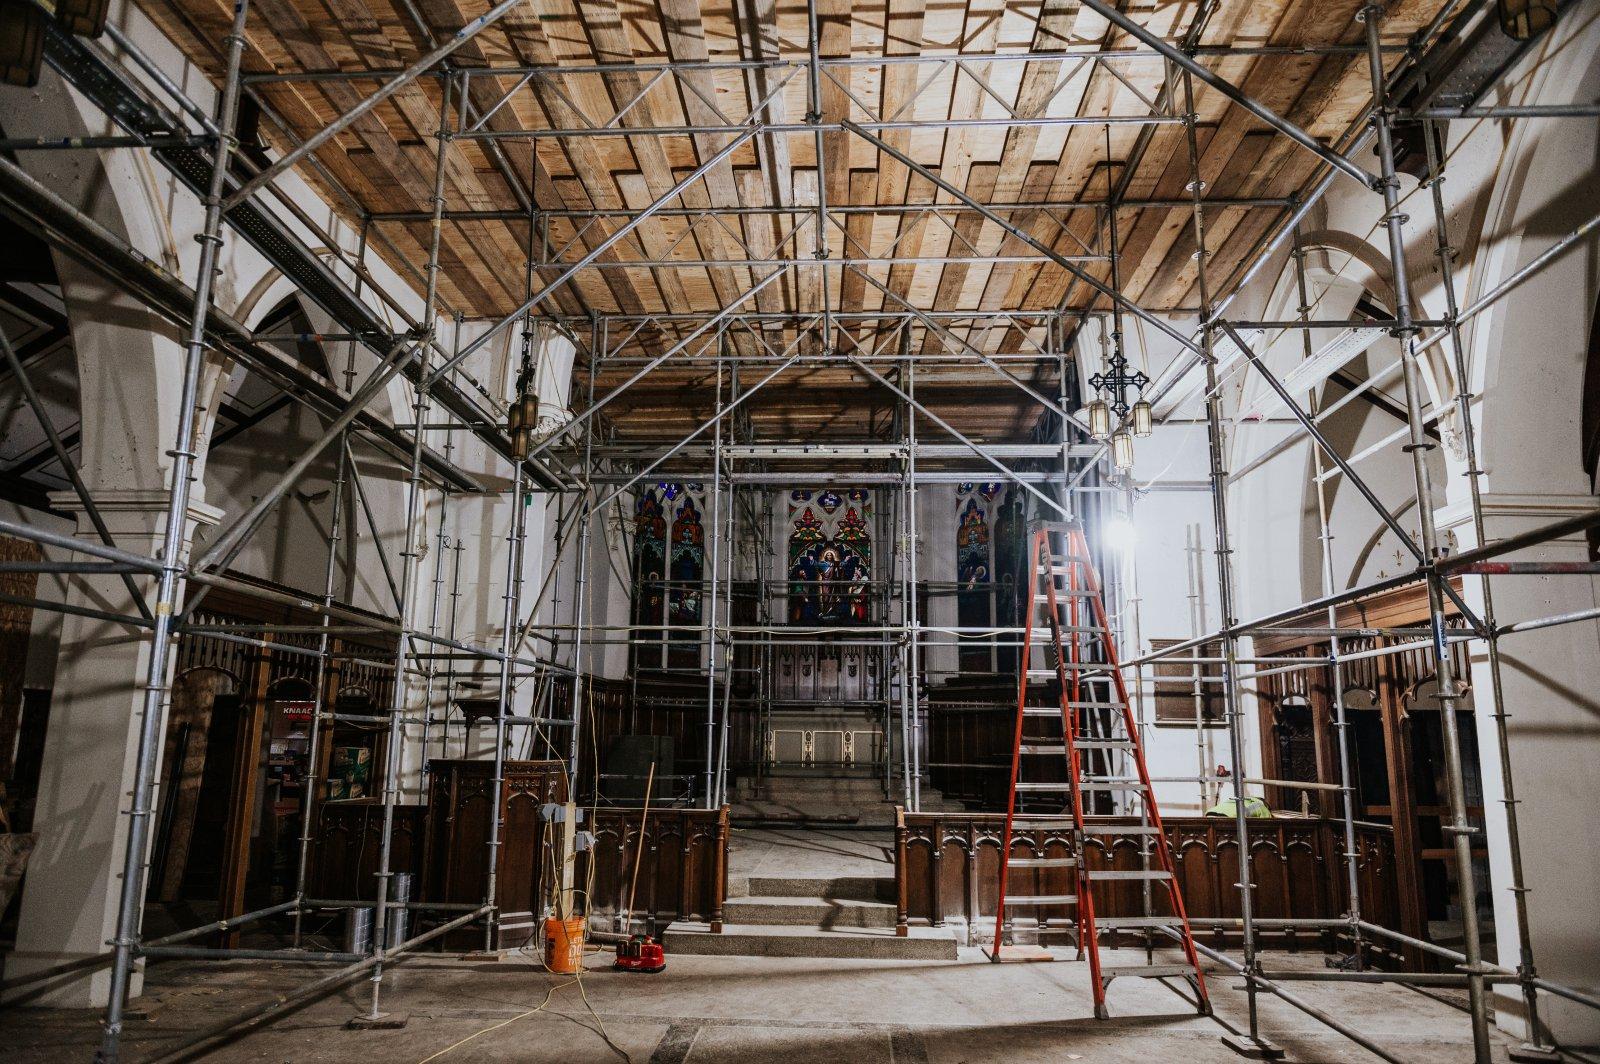 St. James Church - During Renovation